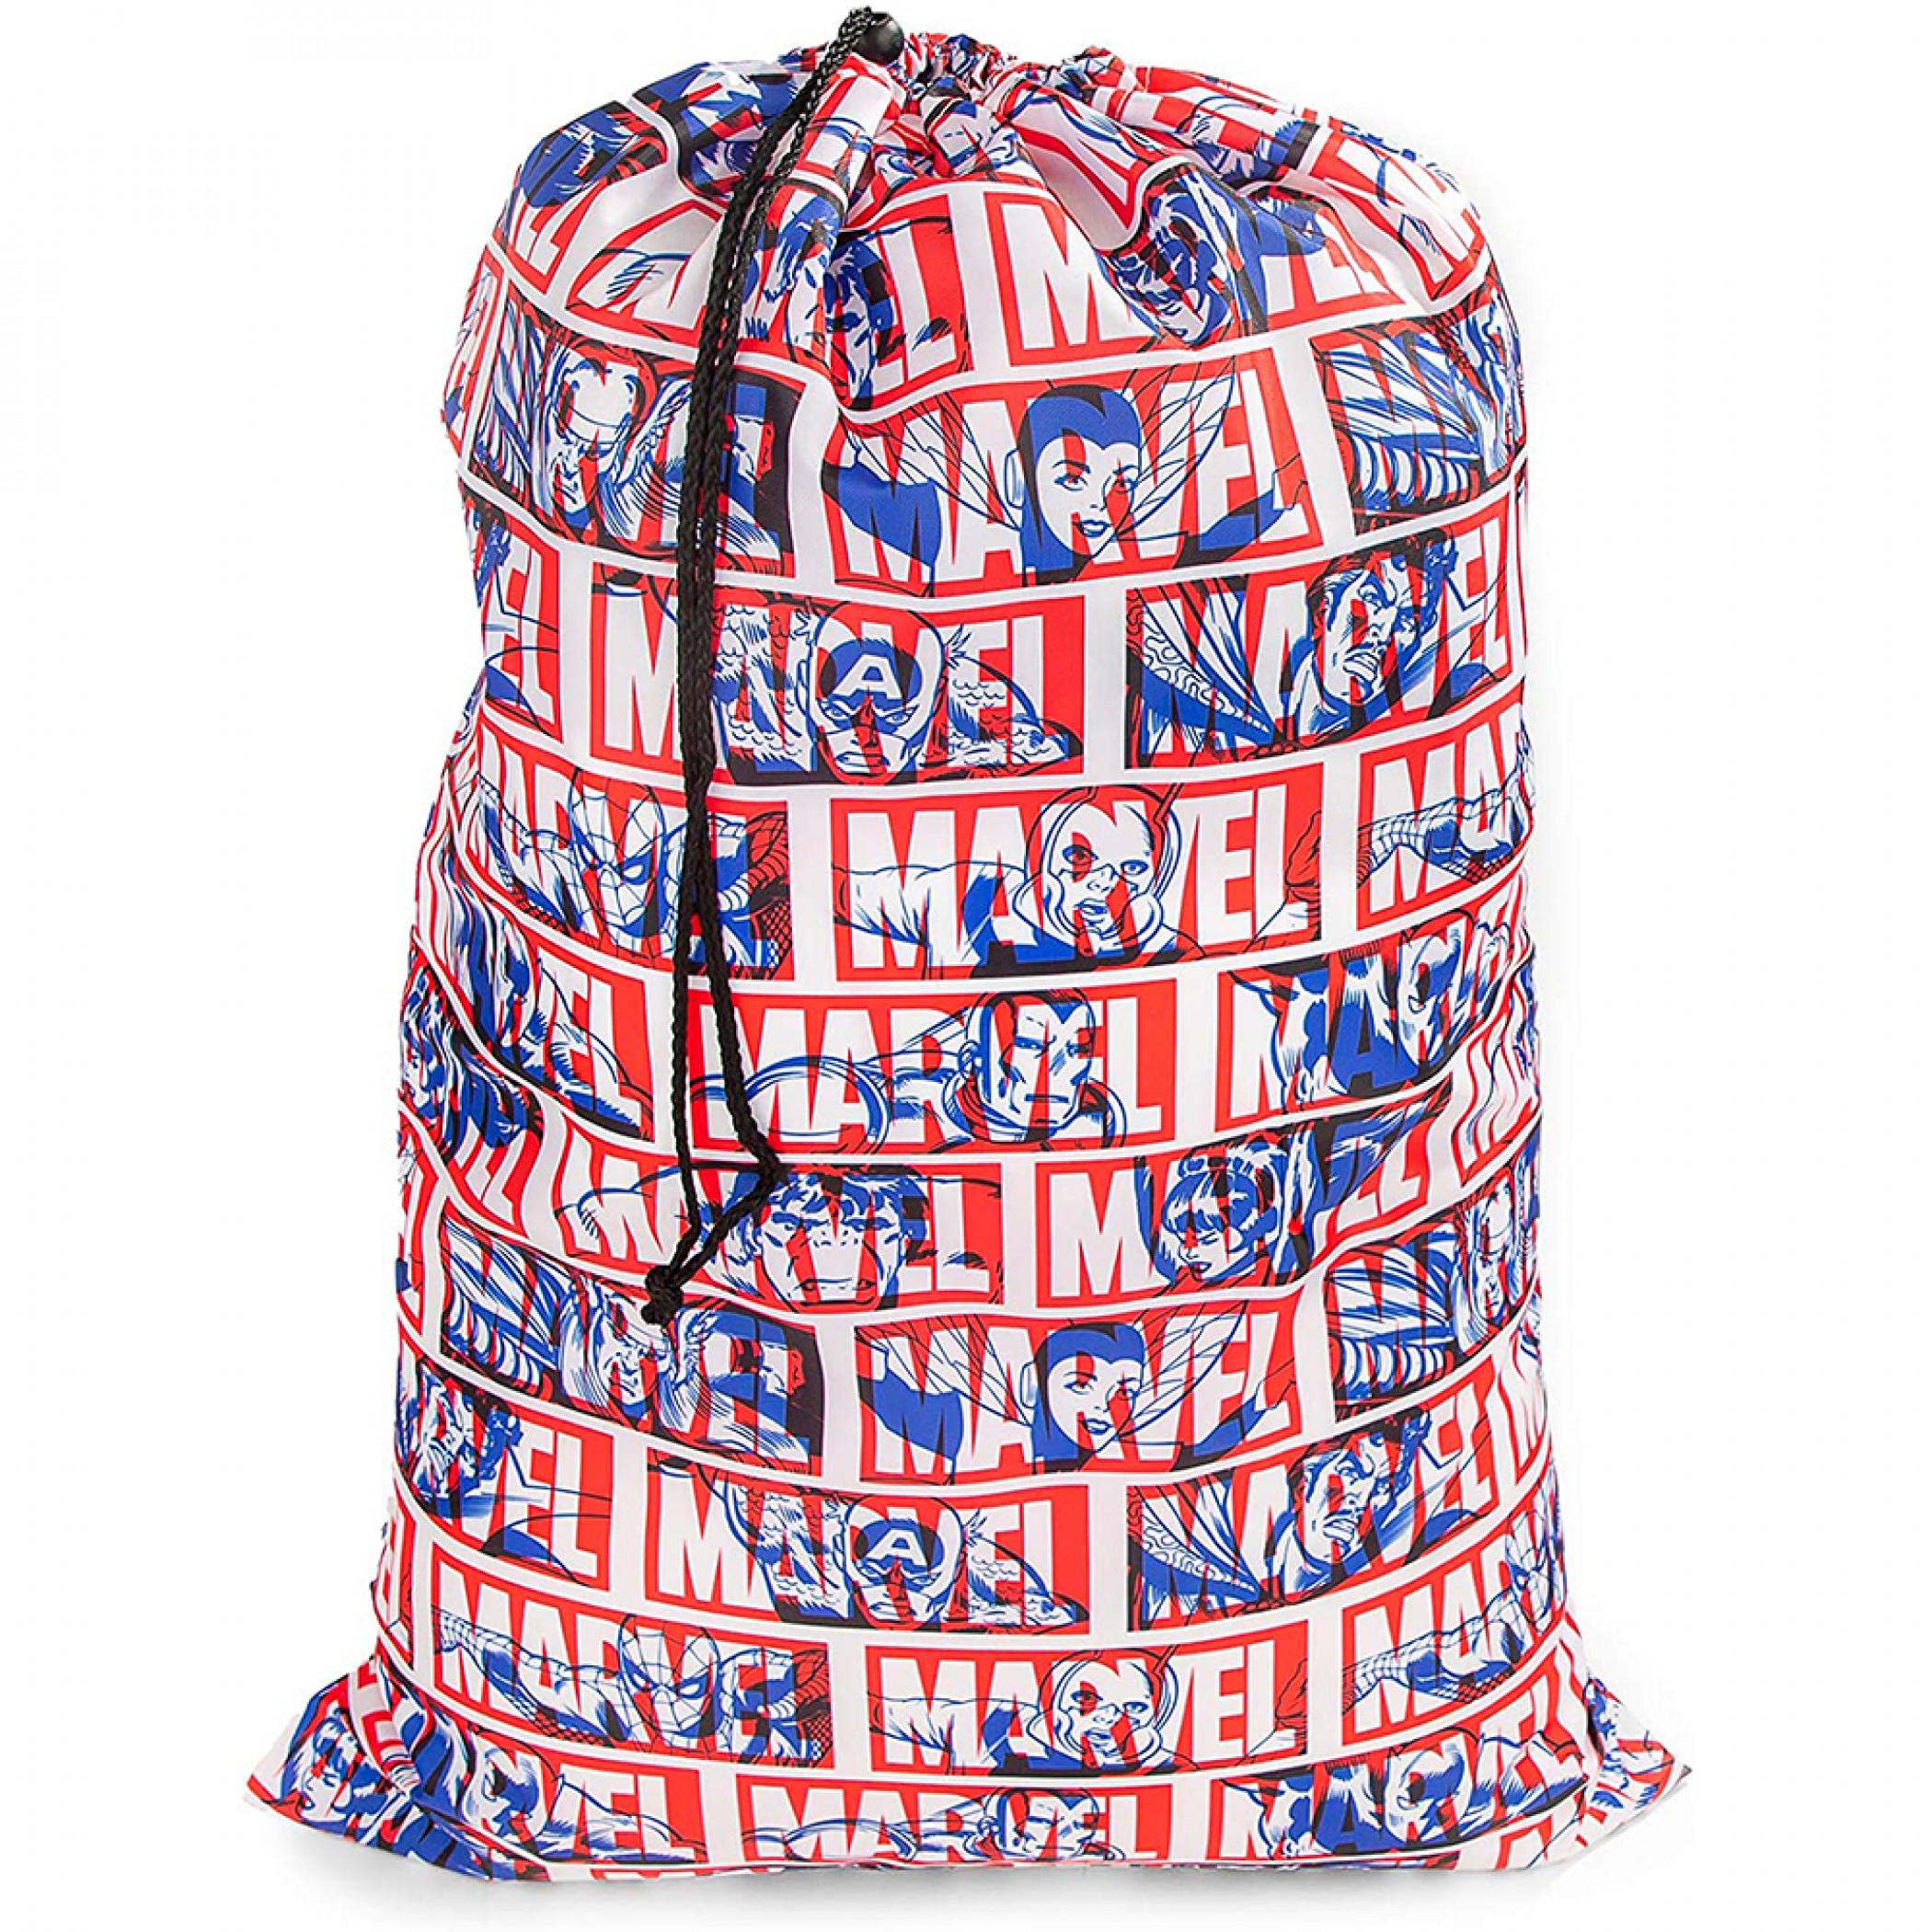 Marvel Comics Avengers Classic Represent Drawstring Laundry Bag